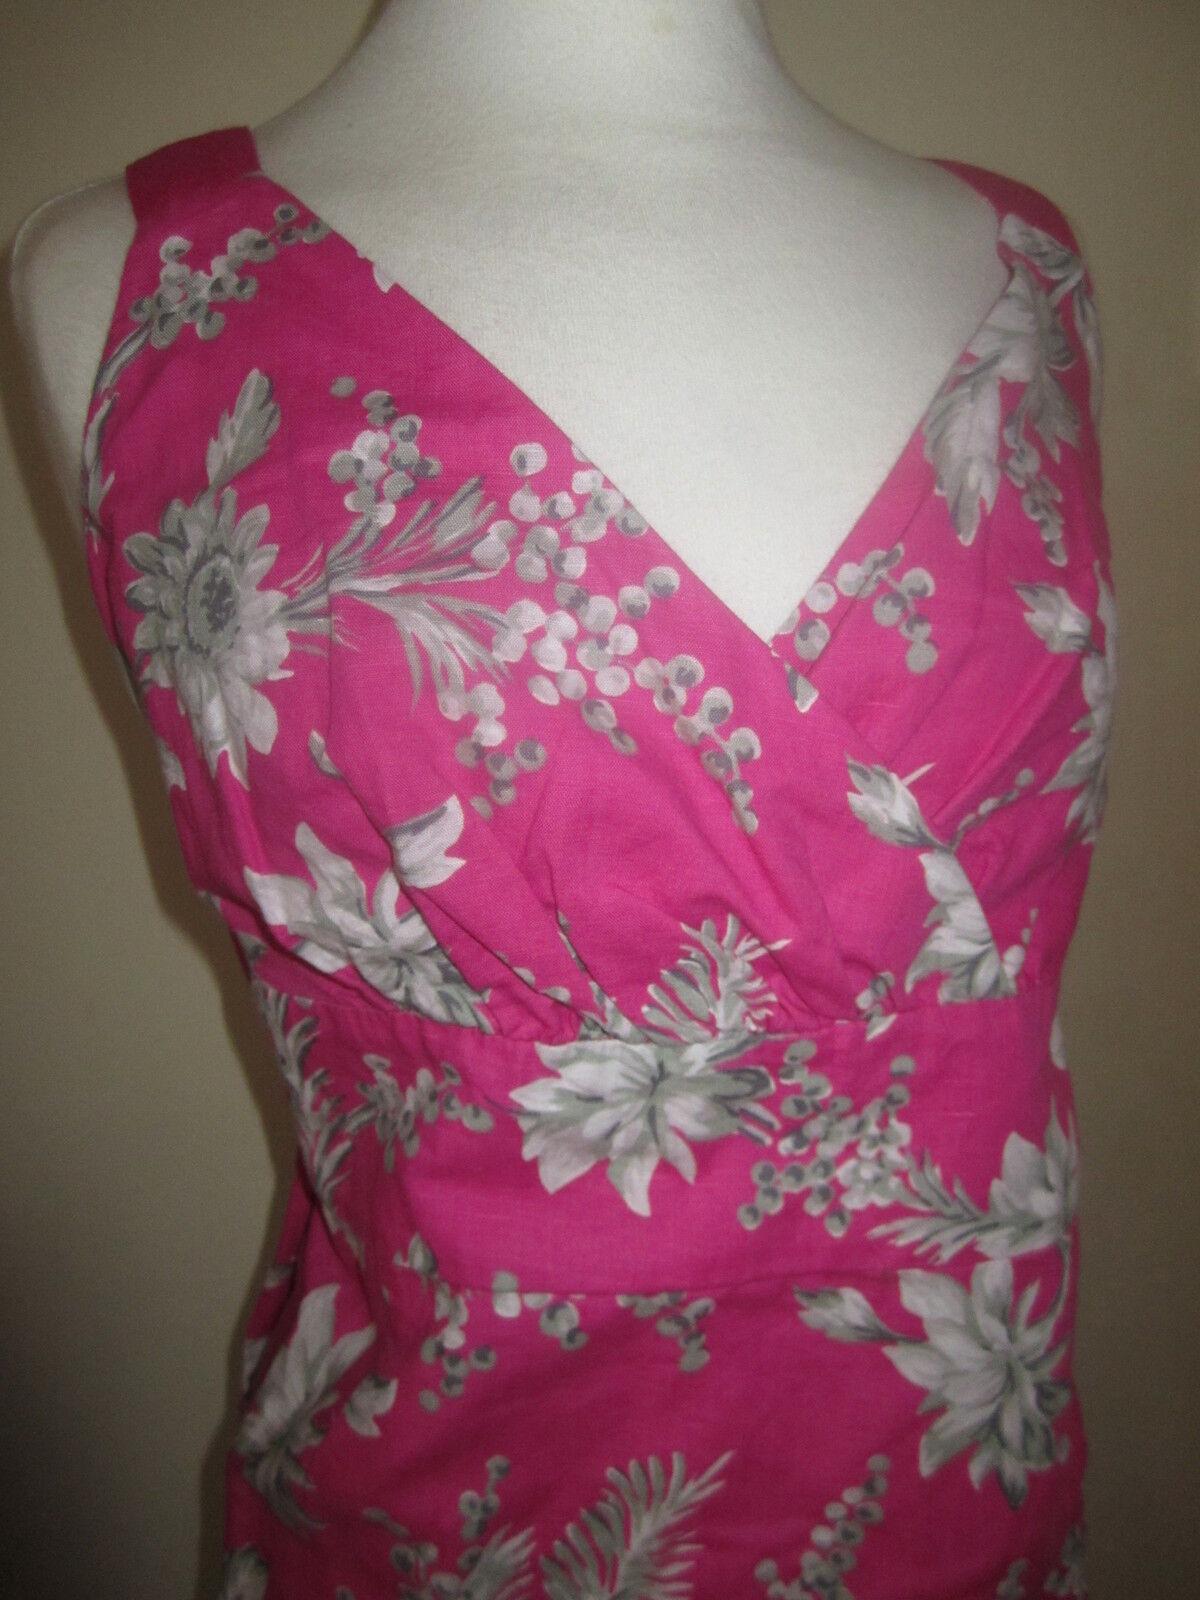 JOULES NEW Linen Mix Elette Floral Floral Floral Dress Sz 8  Free UK P&P | Langfristiger Ruf  909af0